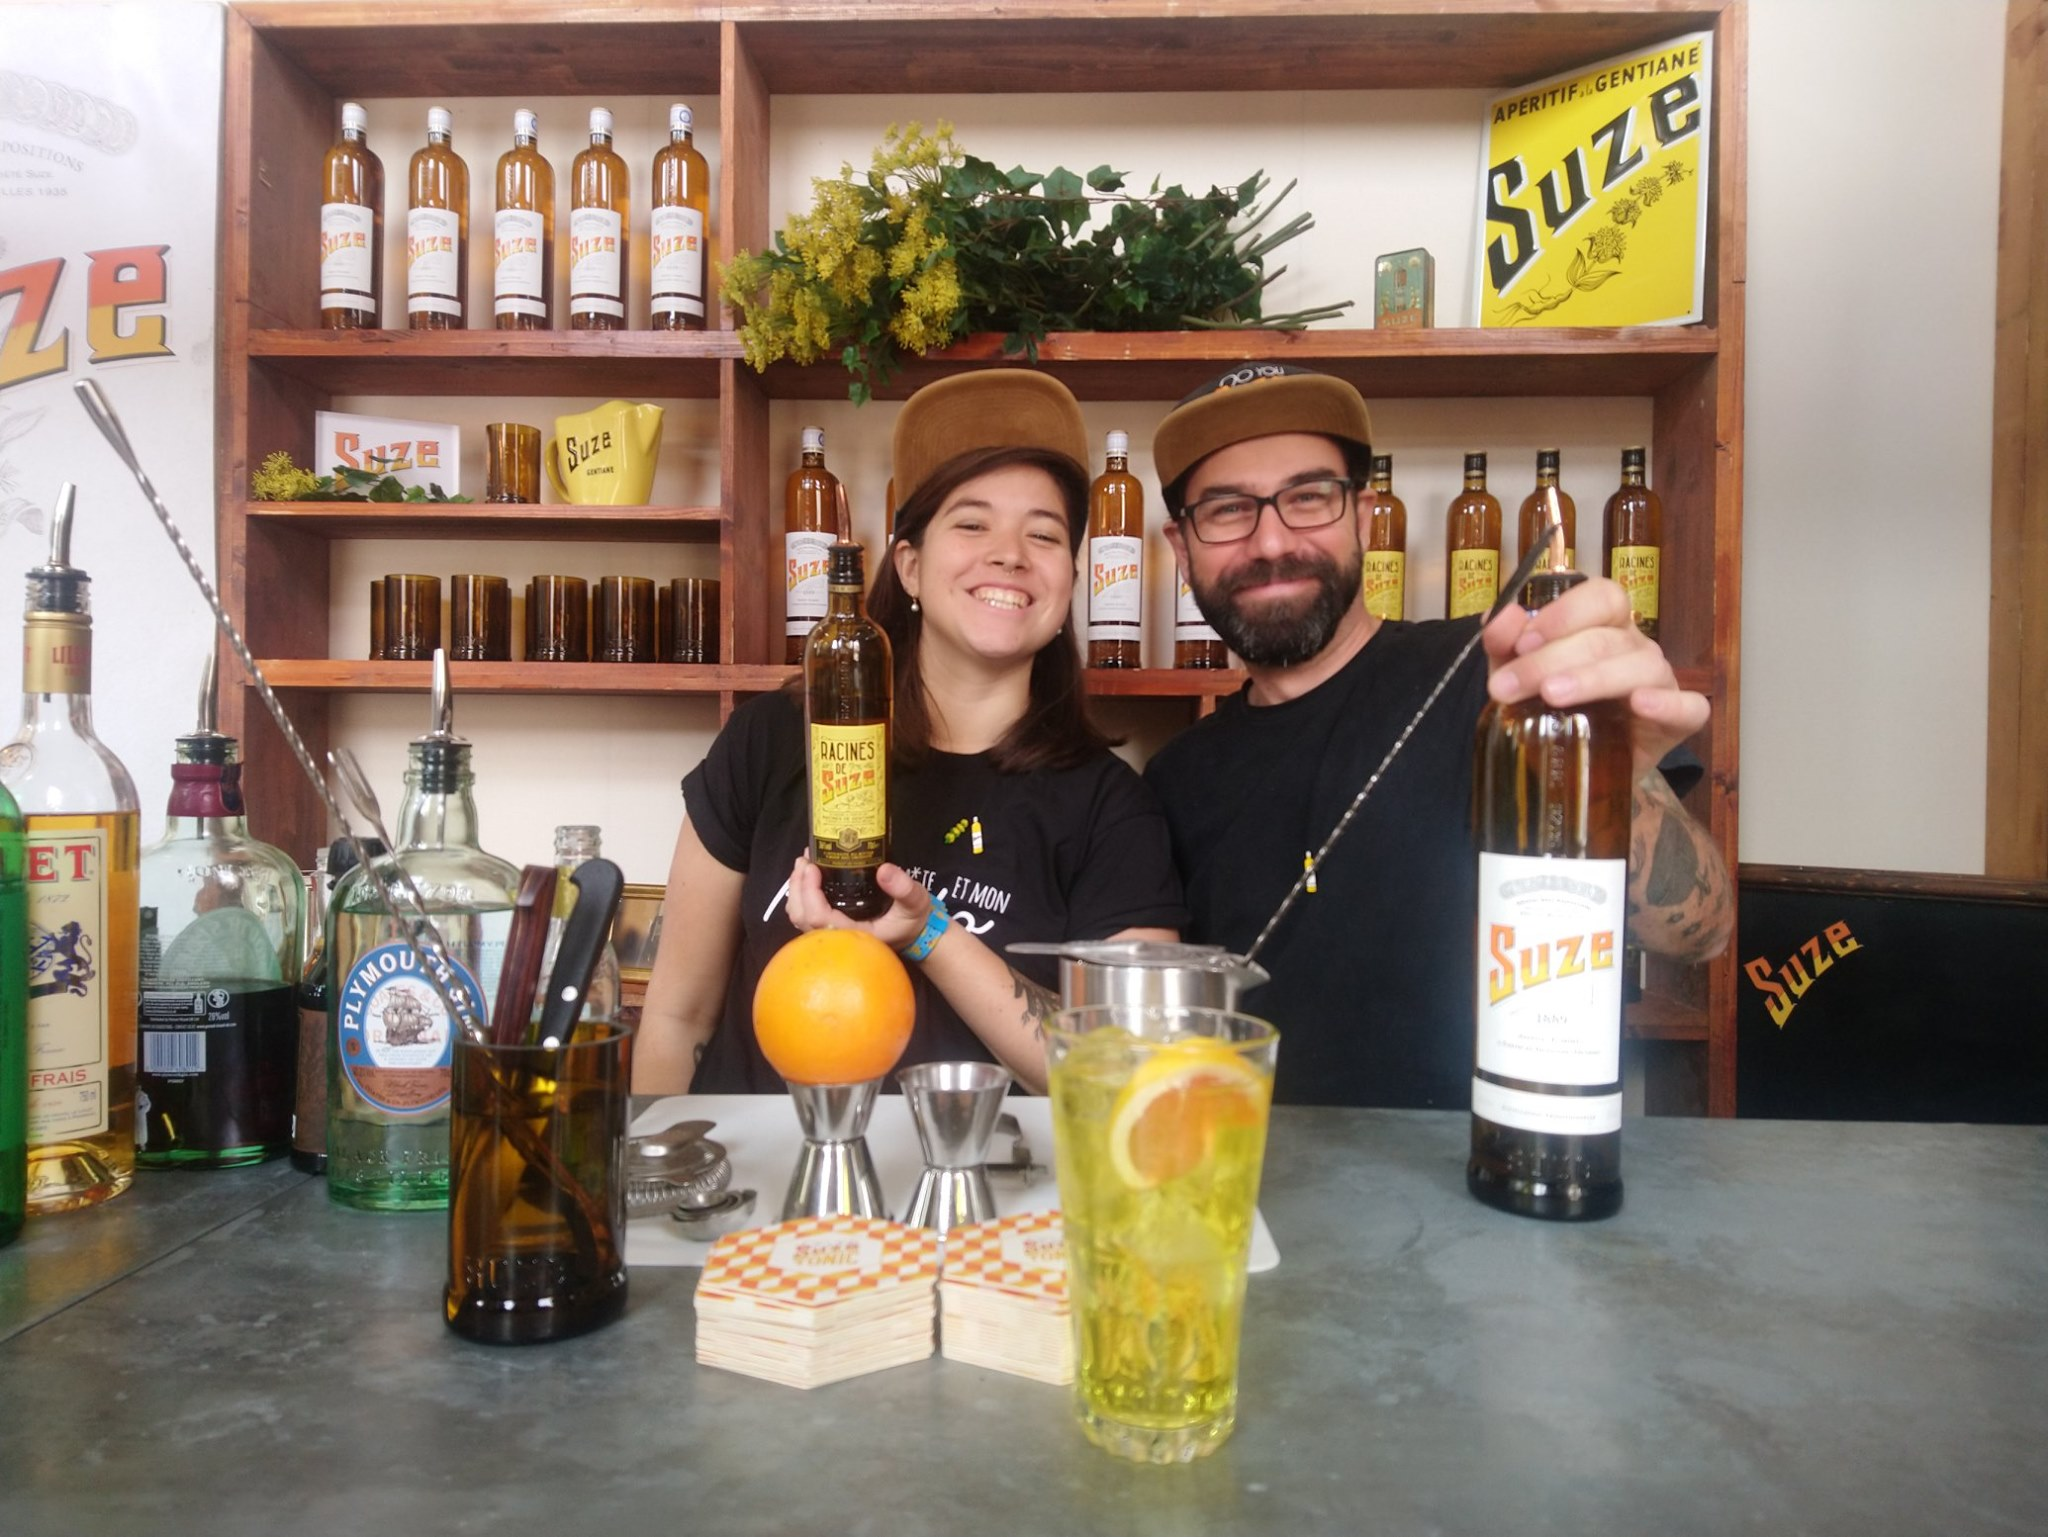 Marie Cabaret - Jean-Sébastien Mélot - Racines de Suze - Cocktails Spirits 2019